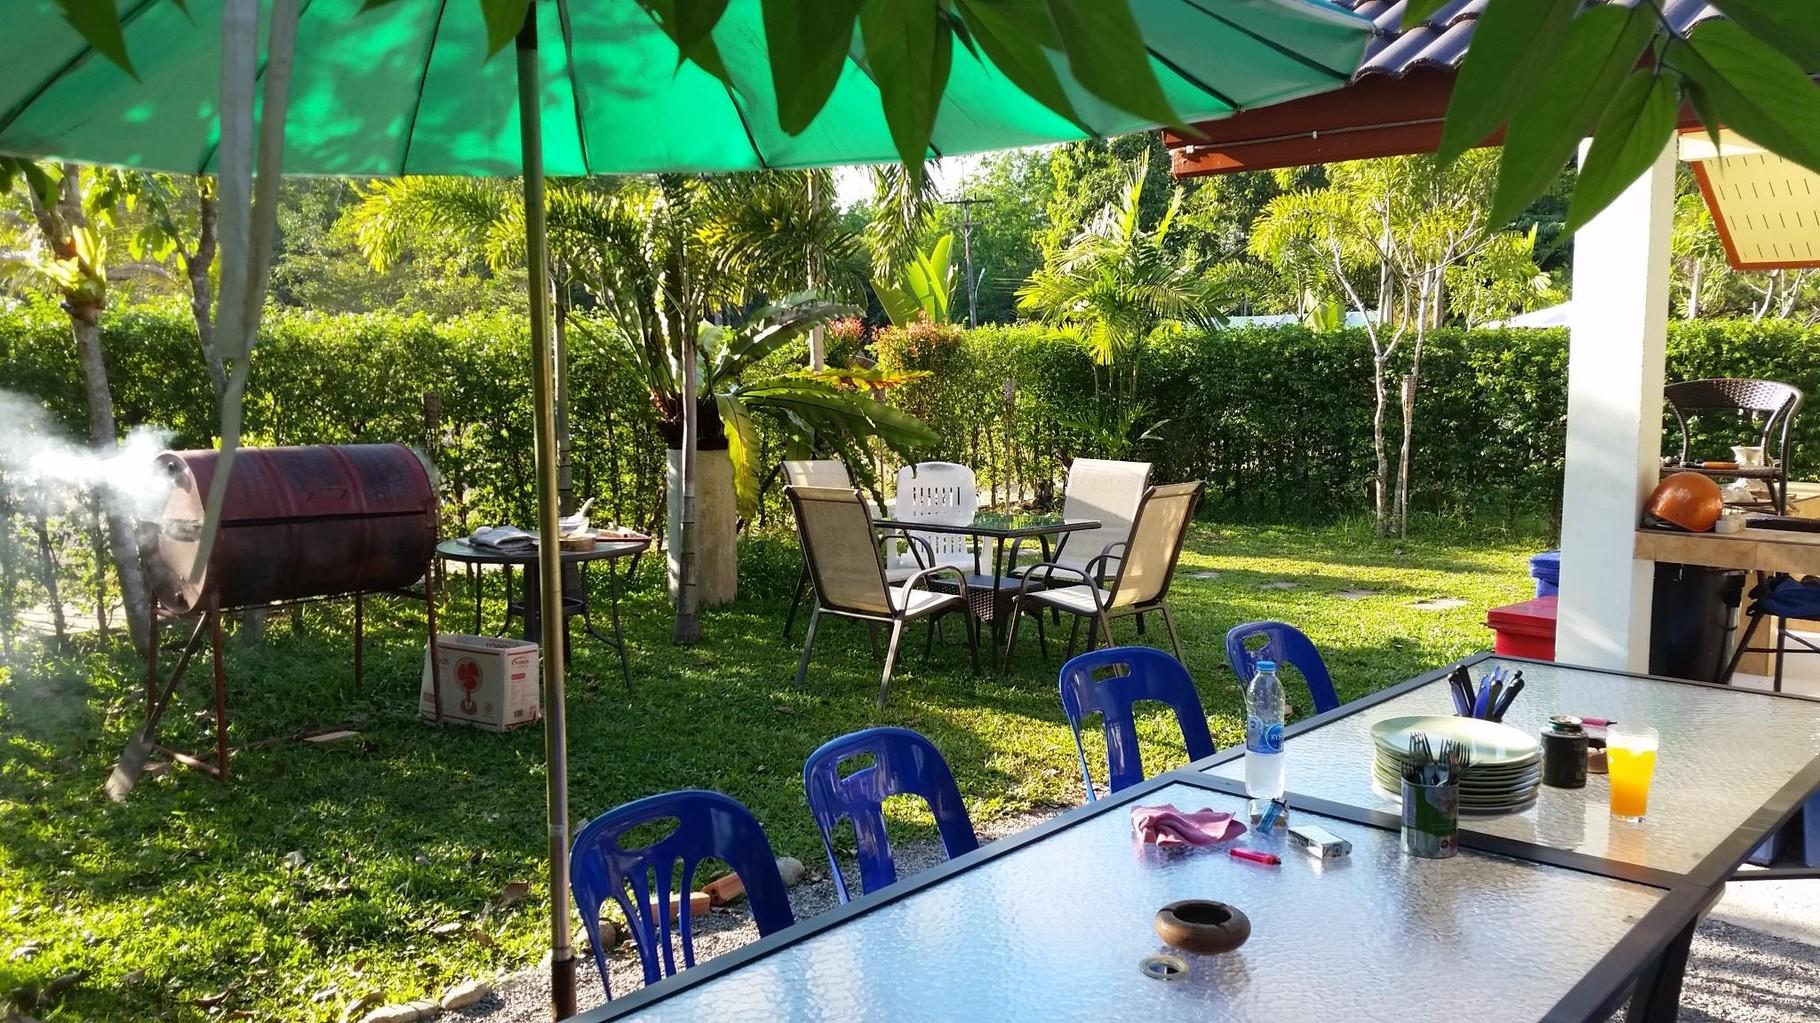 Gartensitzplatz der Gemeinschaftskueche